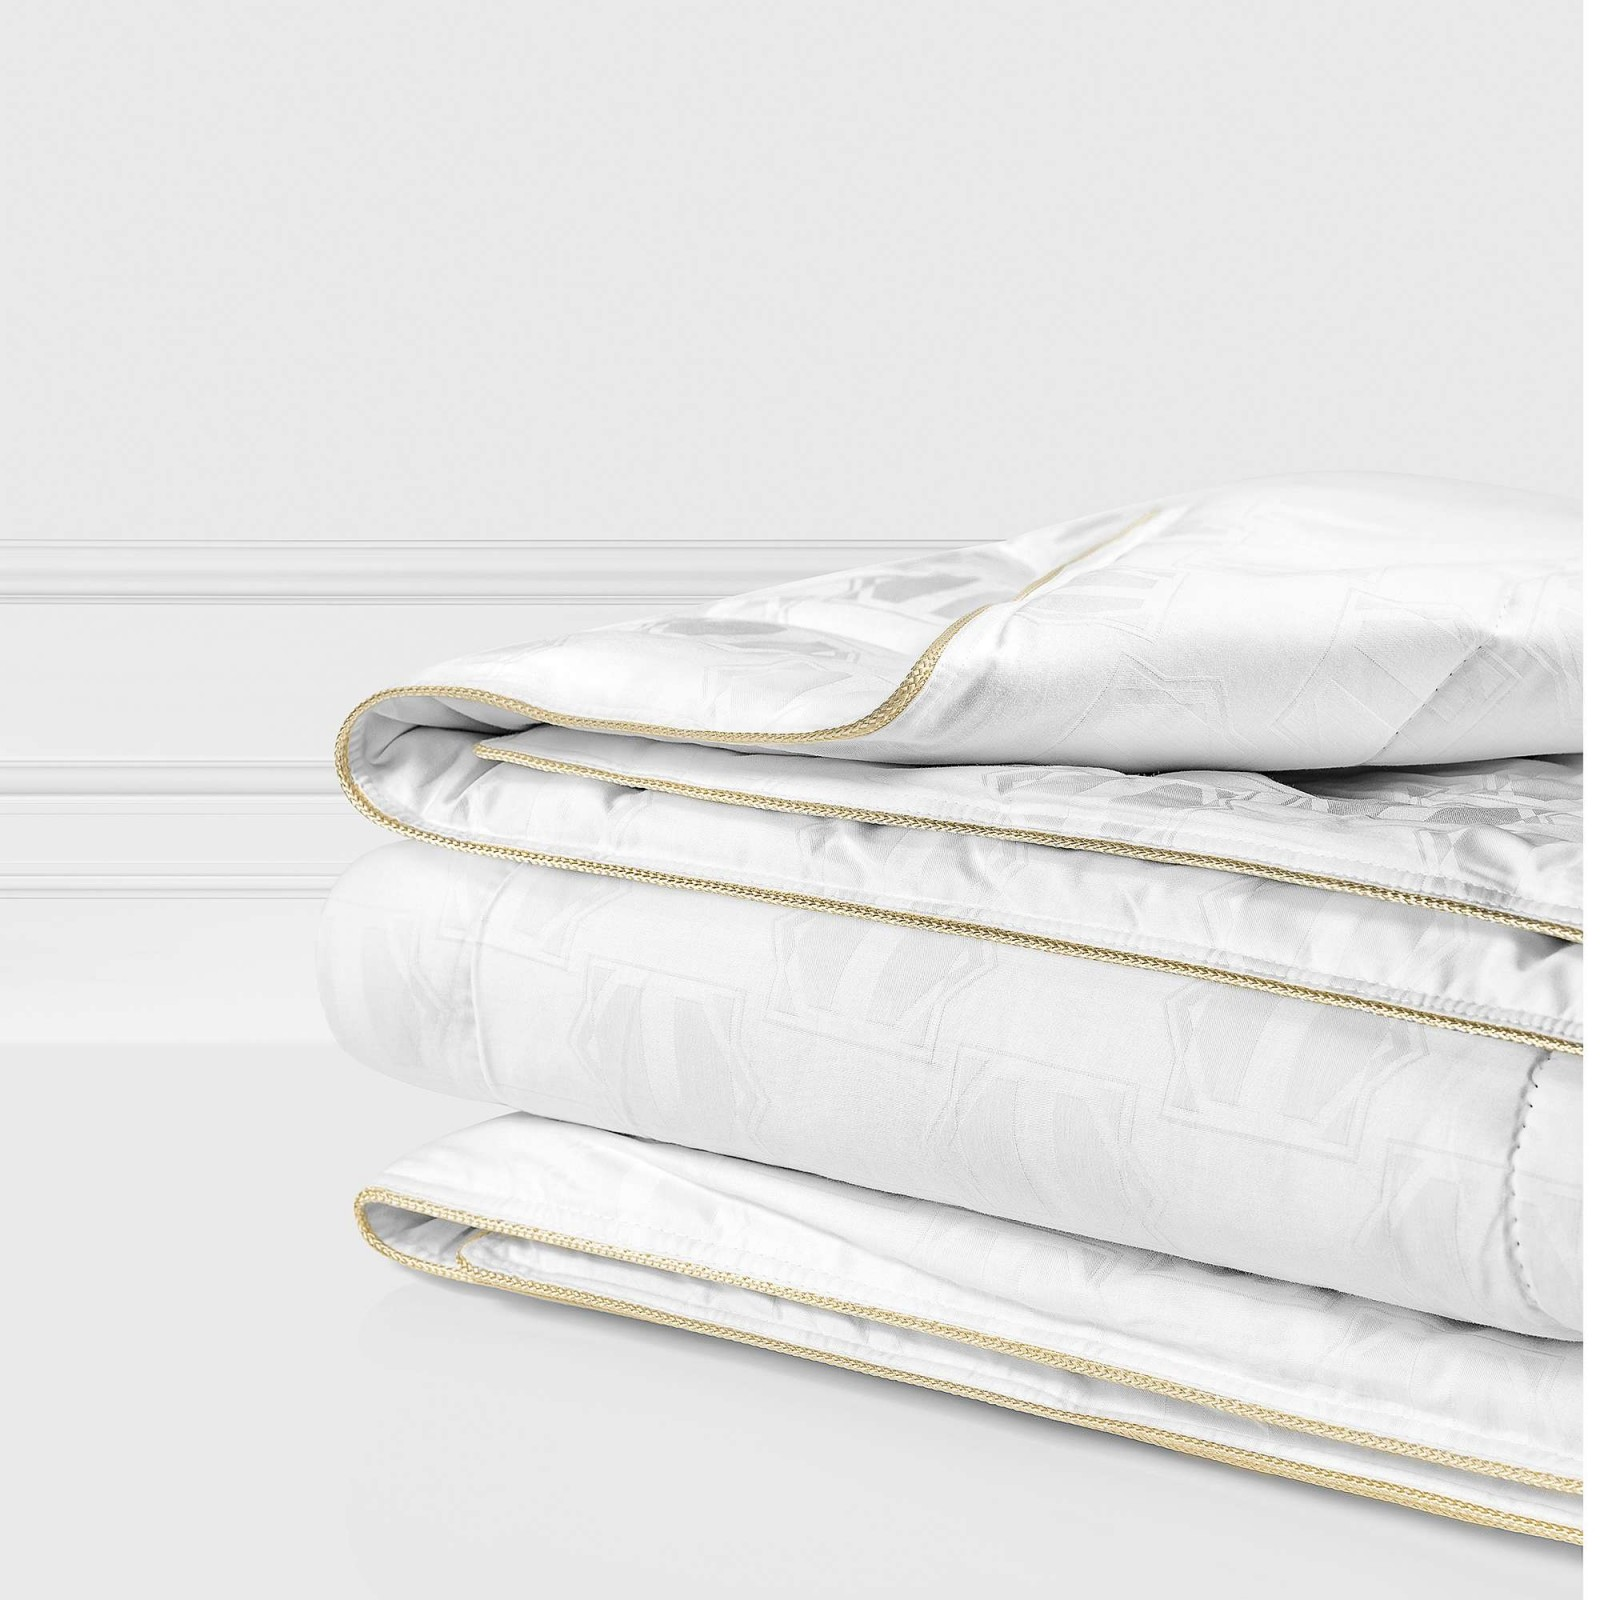 Одеяла Togas Одеяло Маэстро Всесезонное (200х210 см) одеяла togas одеяло гелиос 220х240 см